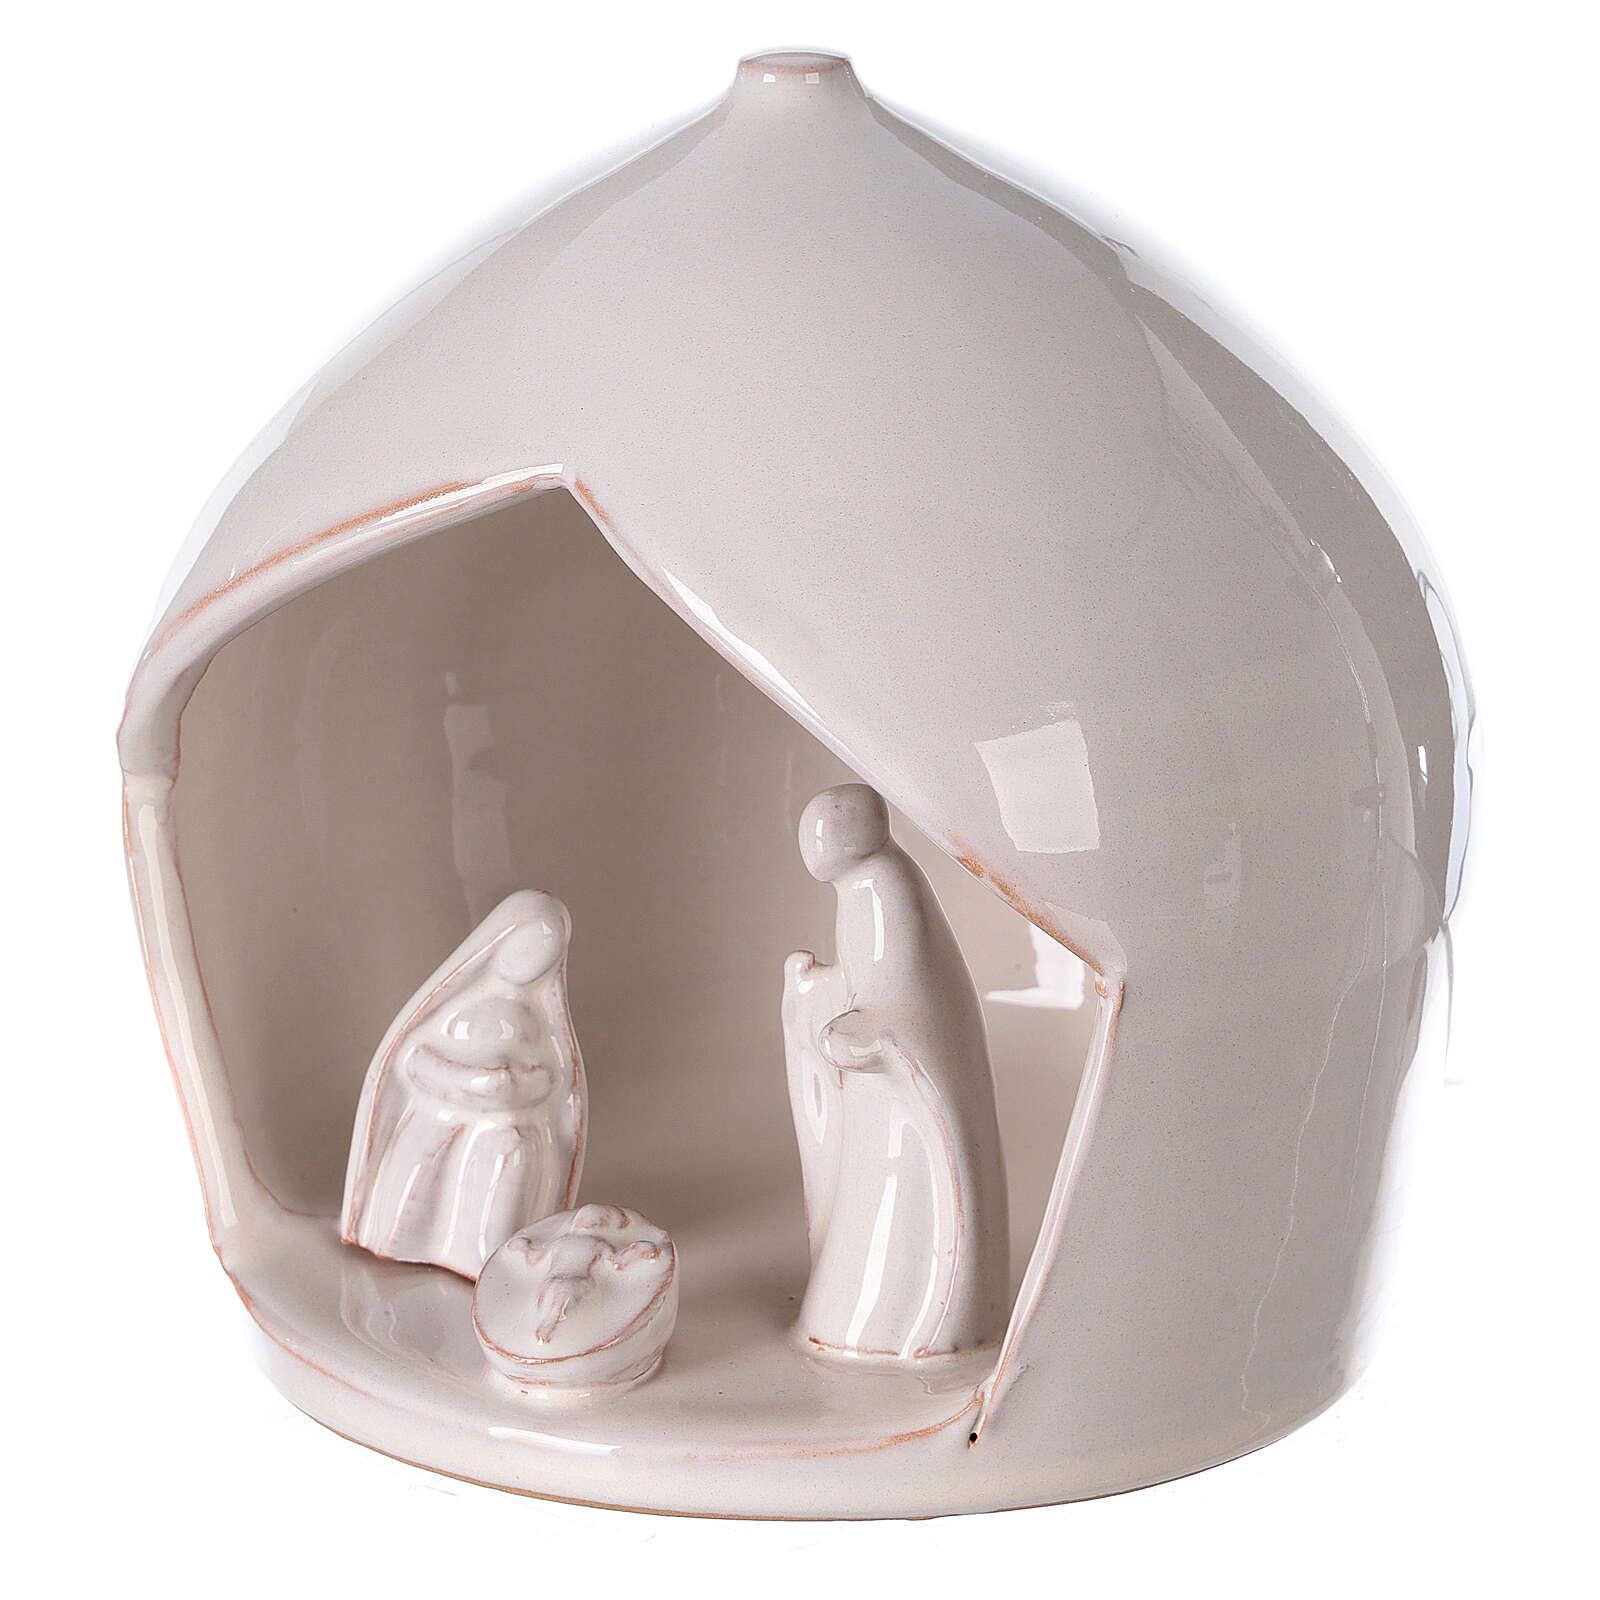 Belén terracota estatuas blancas Natividad Deruta 16x15 cm 4